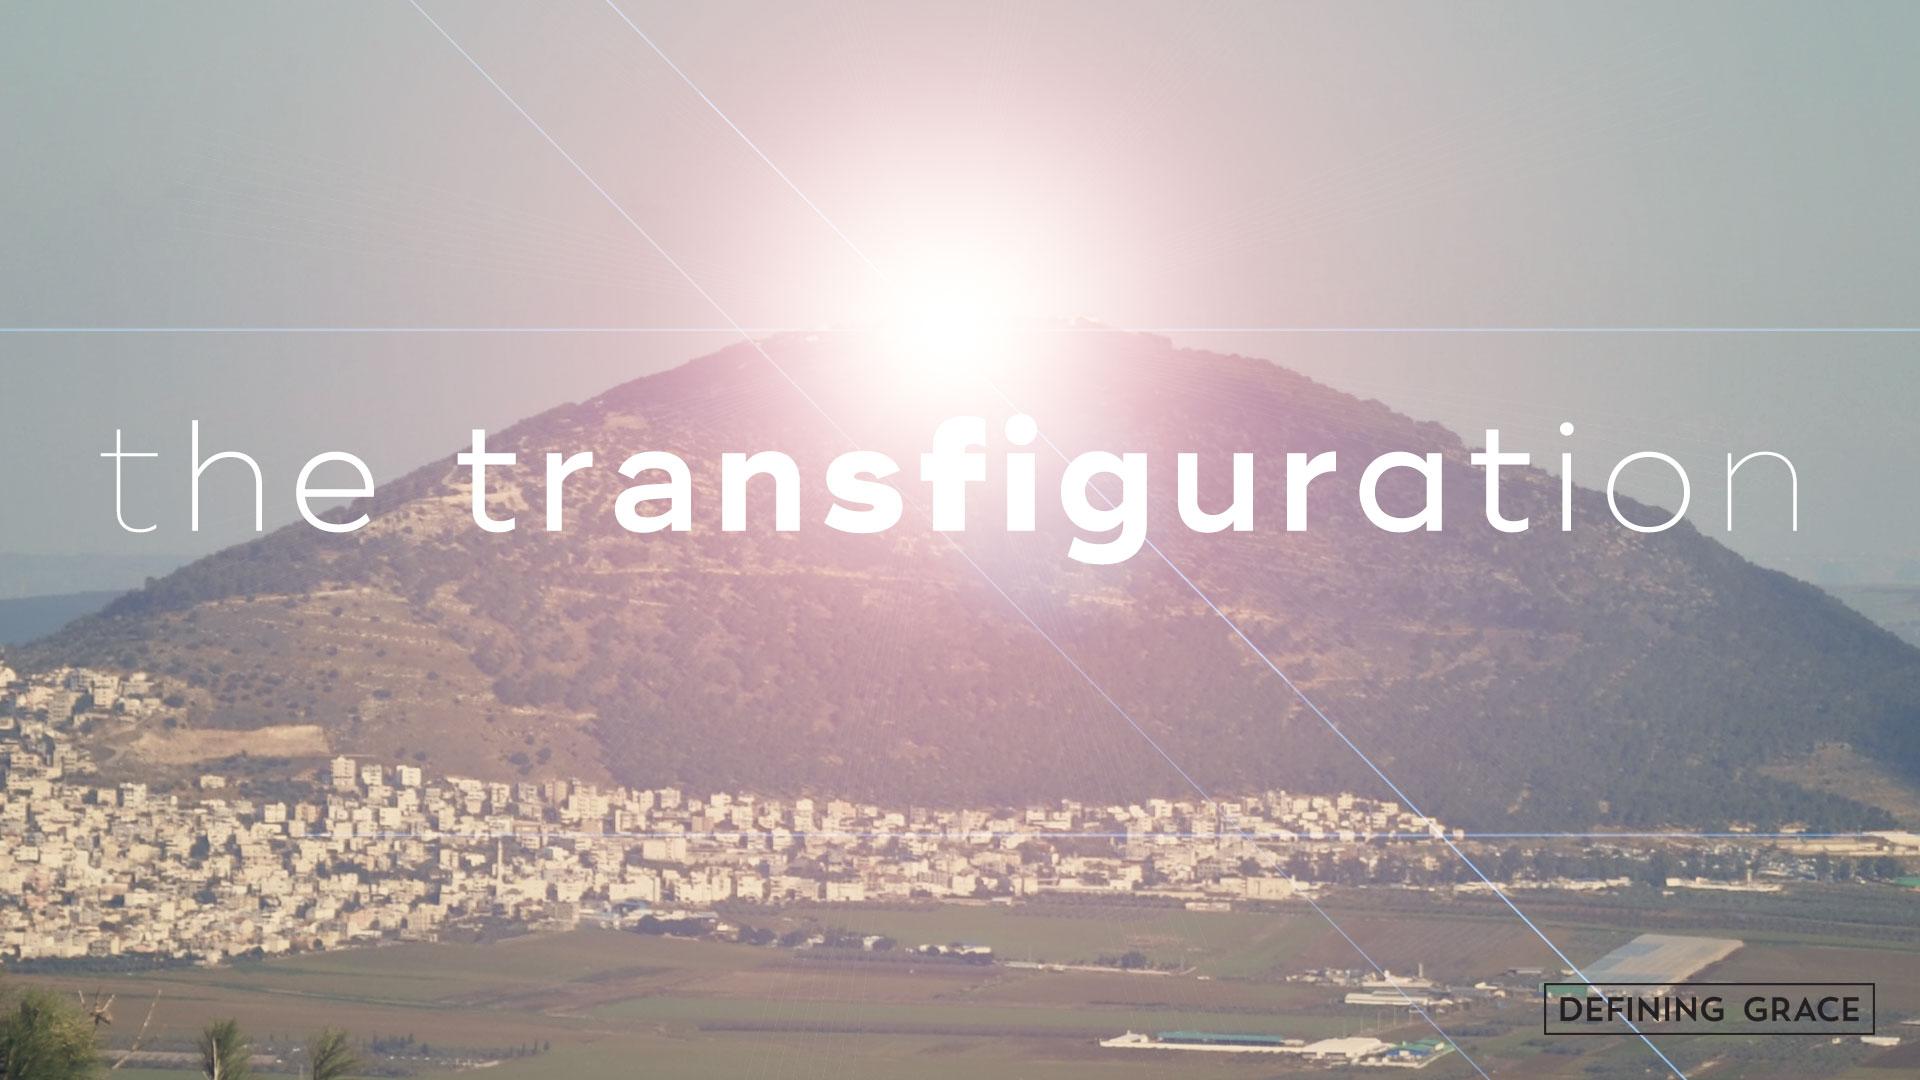 Transfiguration Worship and Social Media Graphics - Defining Grace